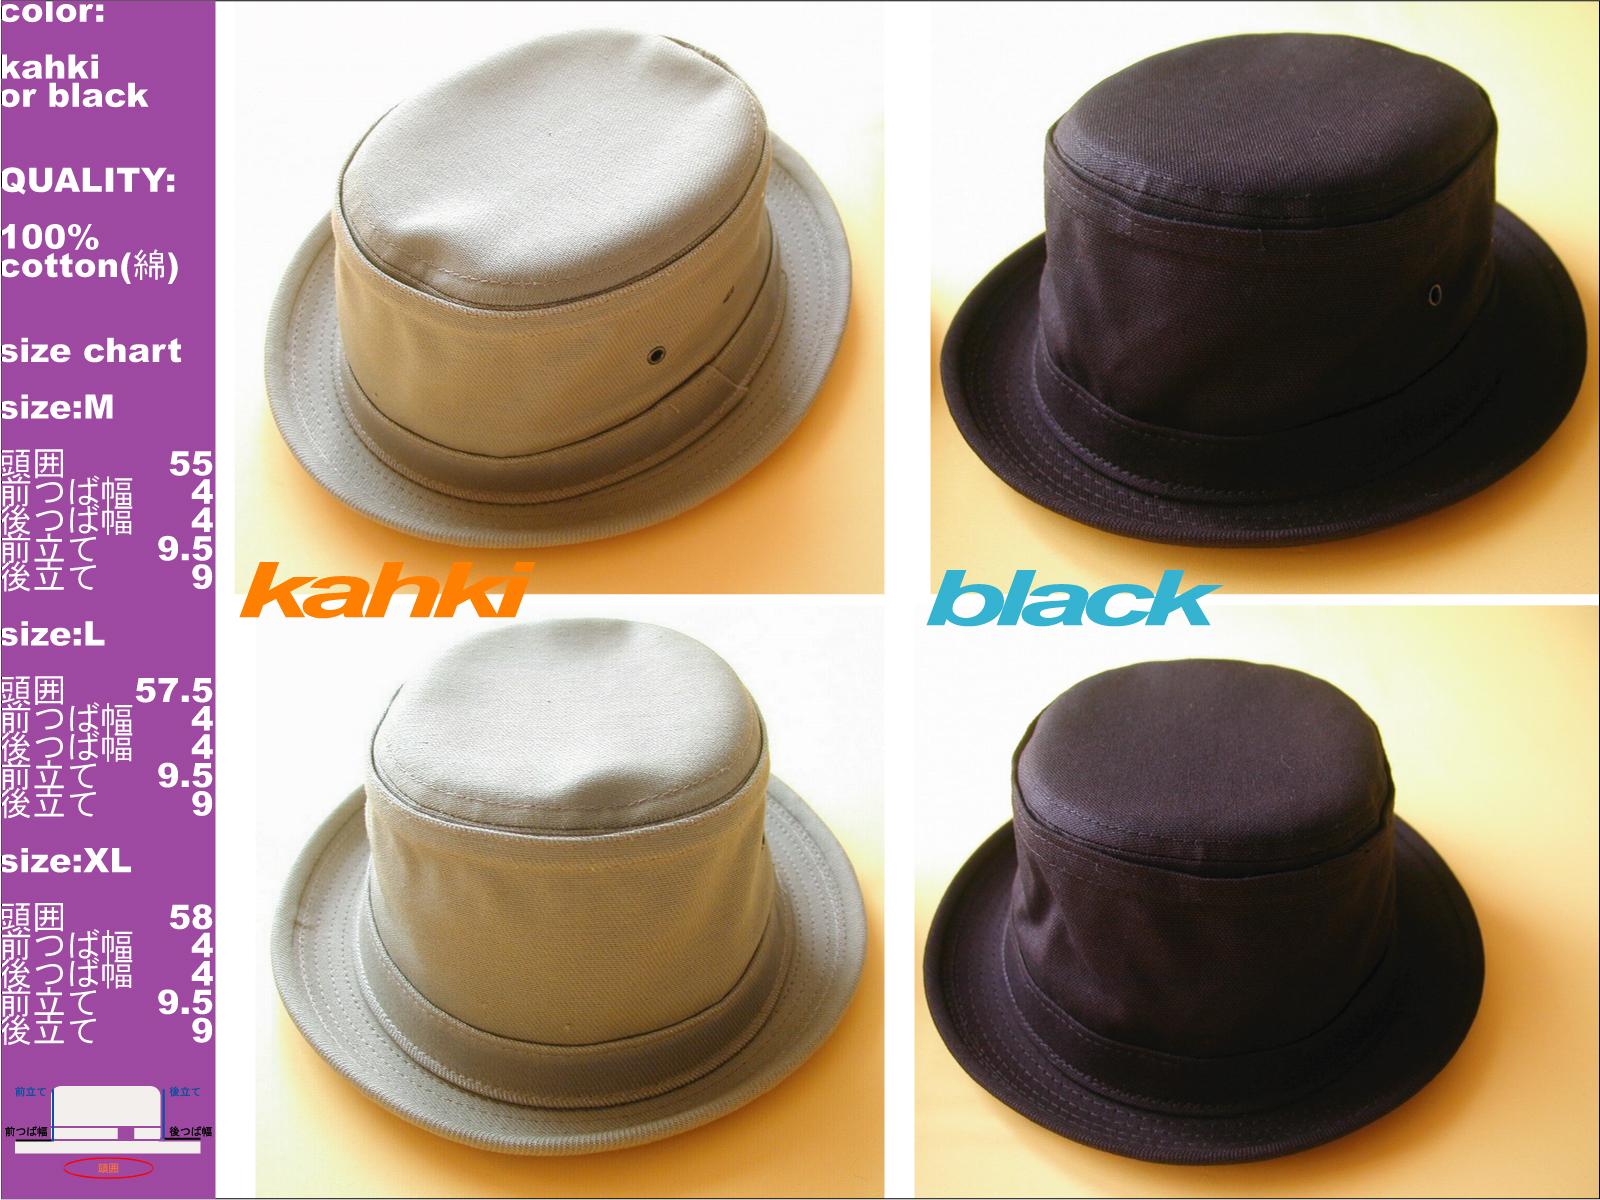 NEW YORK HAT CO. UNISEX canvas pork pie hat 2color에서 뉴욕 모자 유 니 섹스 캔버스 돼지 파이 모자 2 컬러